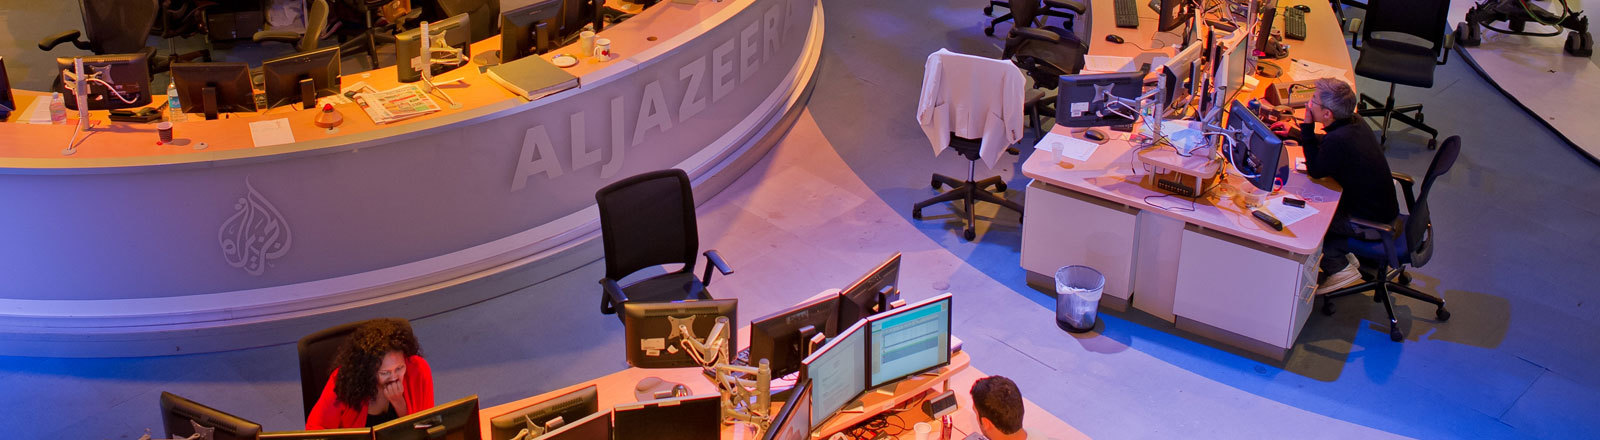 Nachrichtendesk des Senders Al Jazeera in Doha, Katar